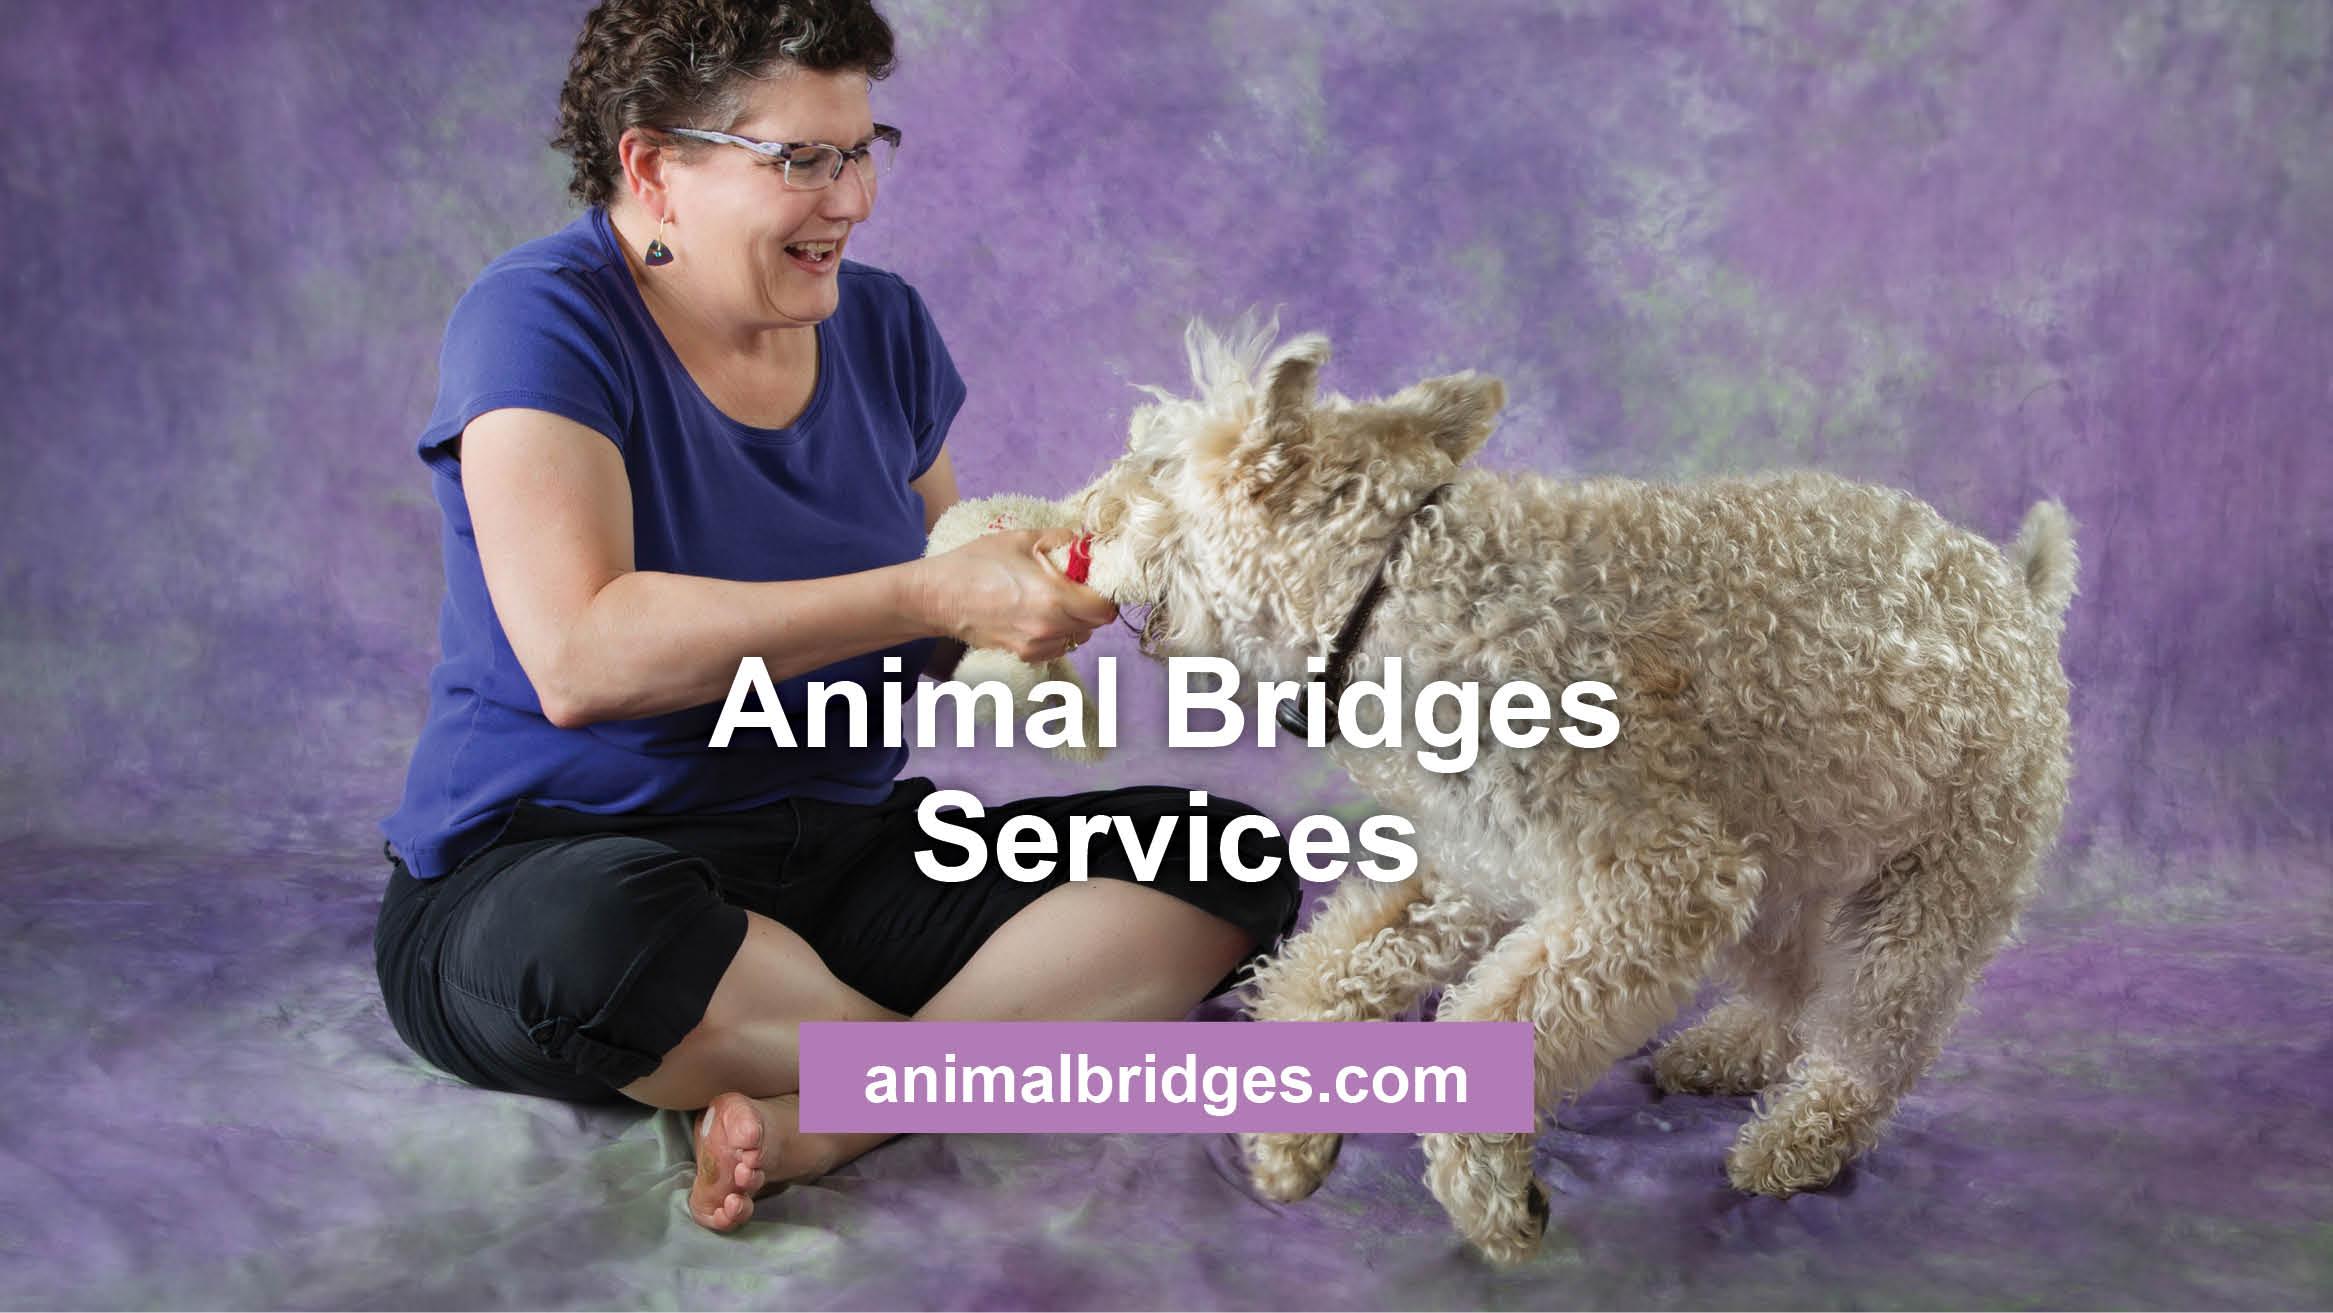 animal-bridges-services